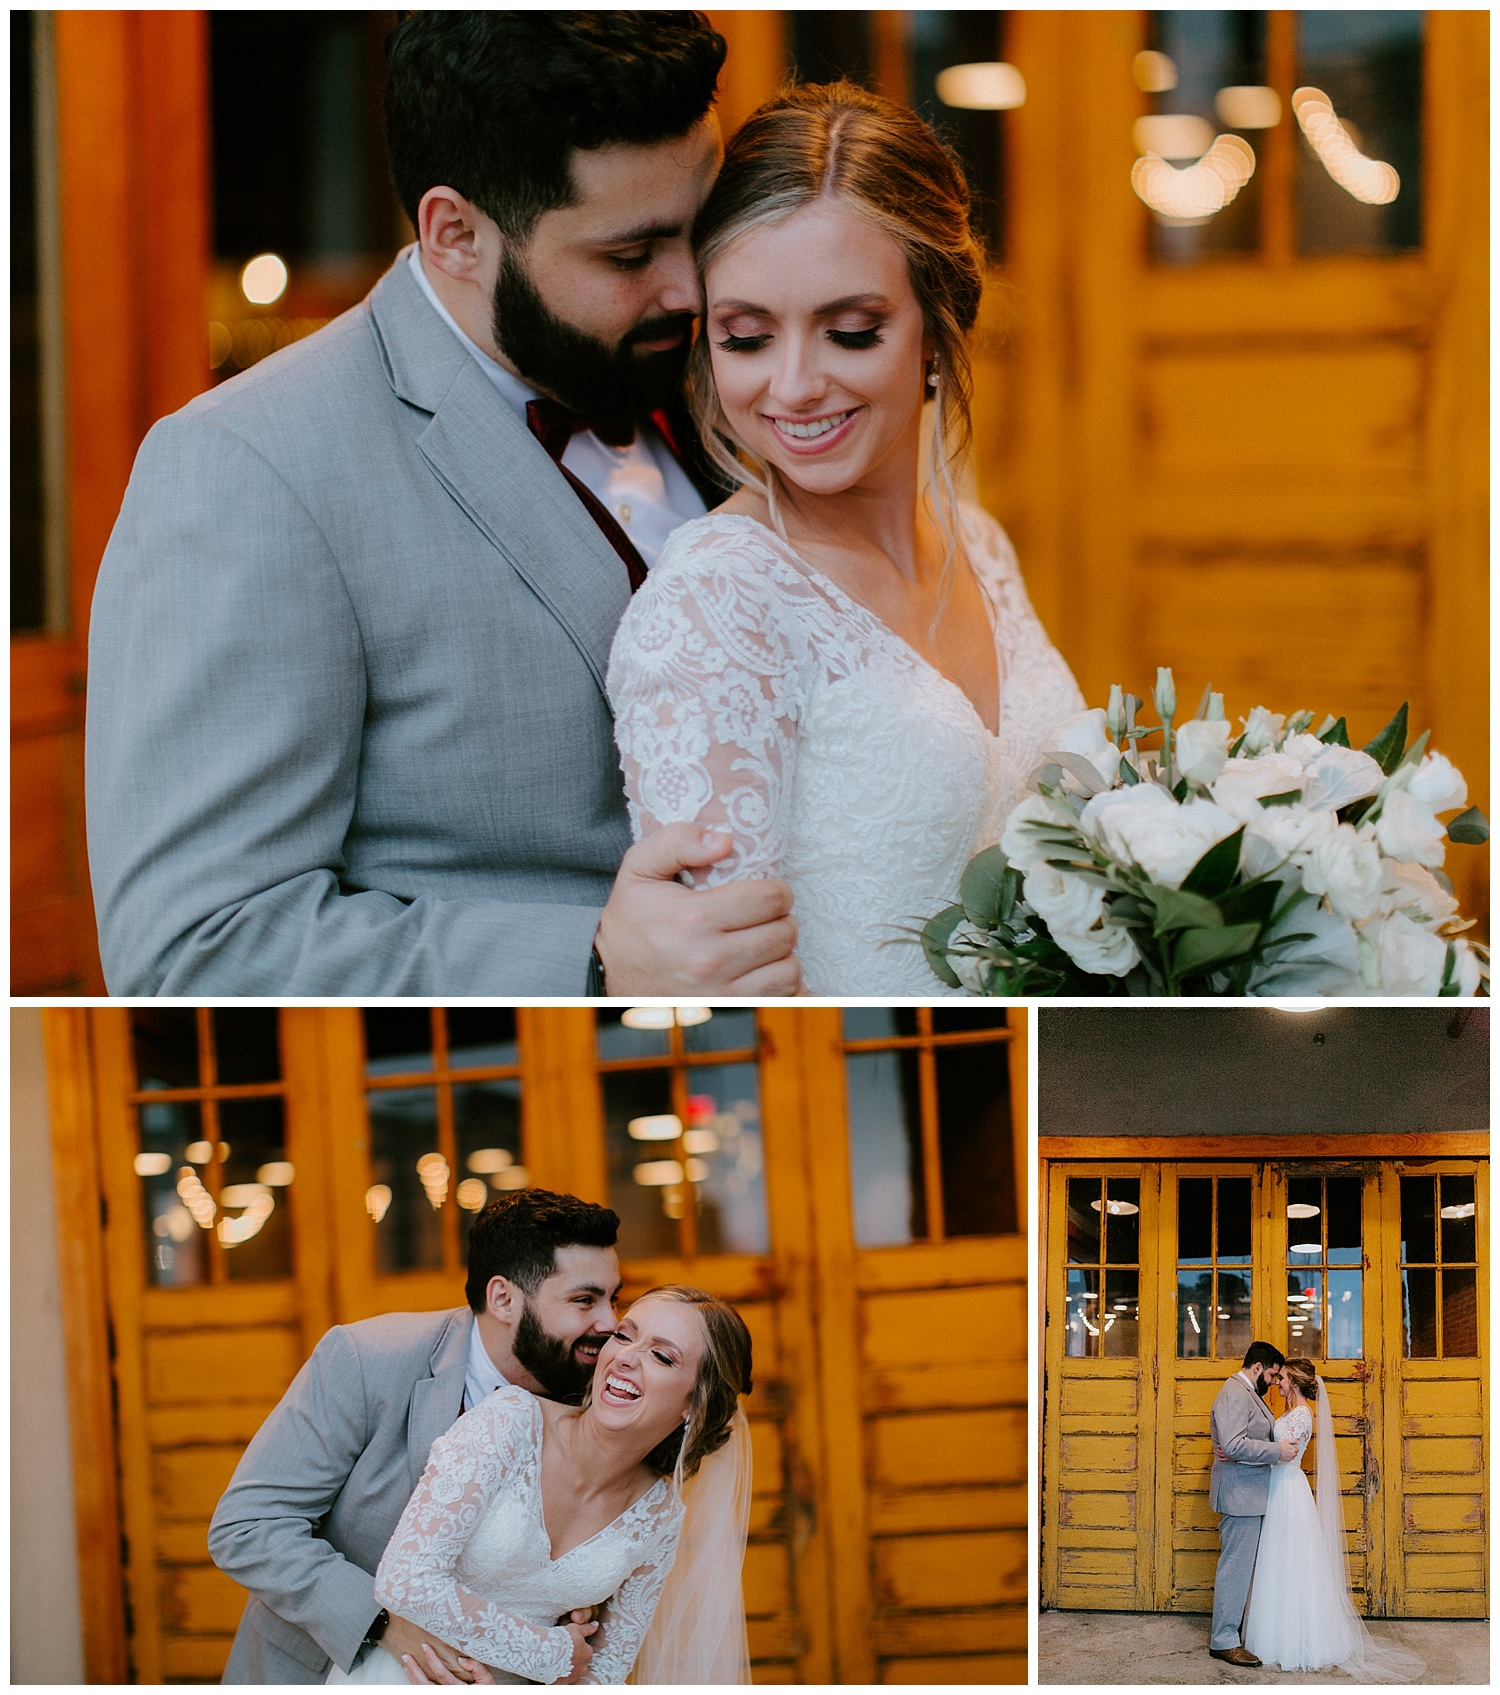 winter-wedding-the standard-knoxville_2019-01-23_0068.jpg